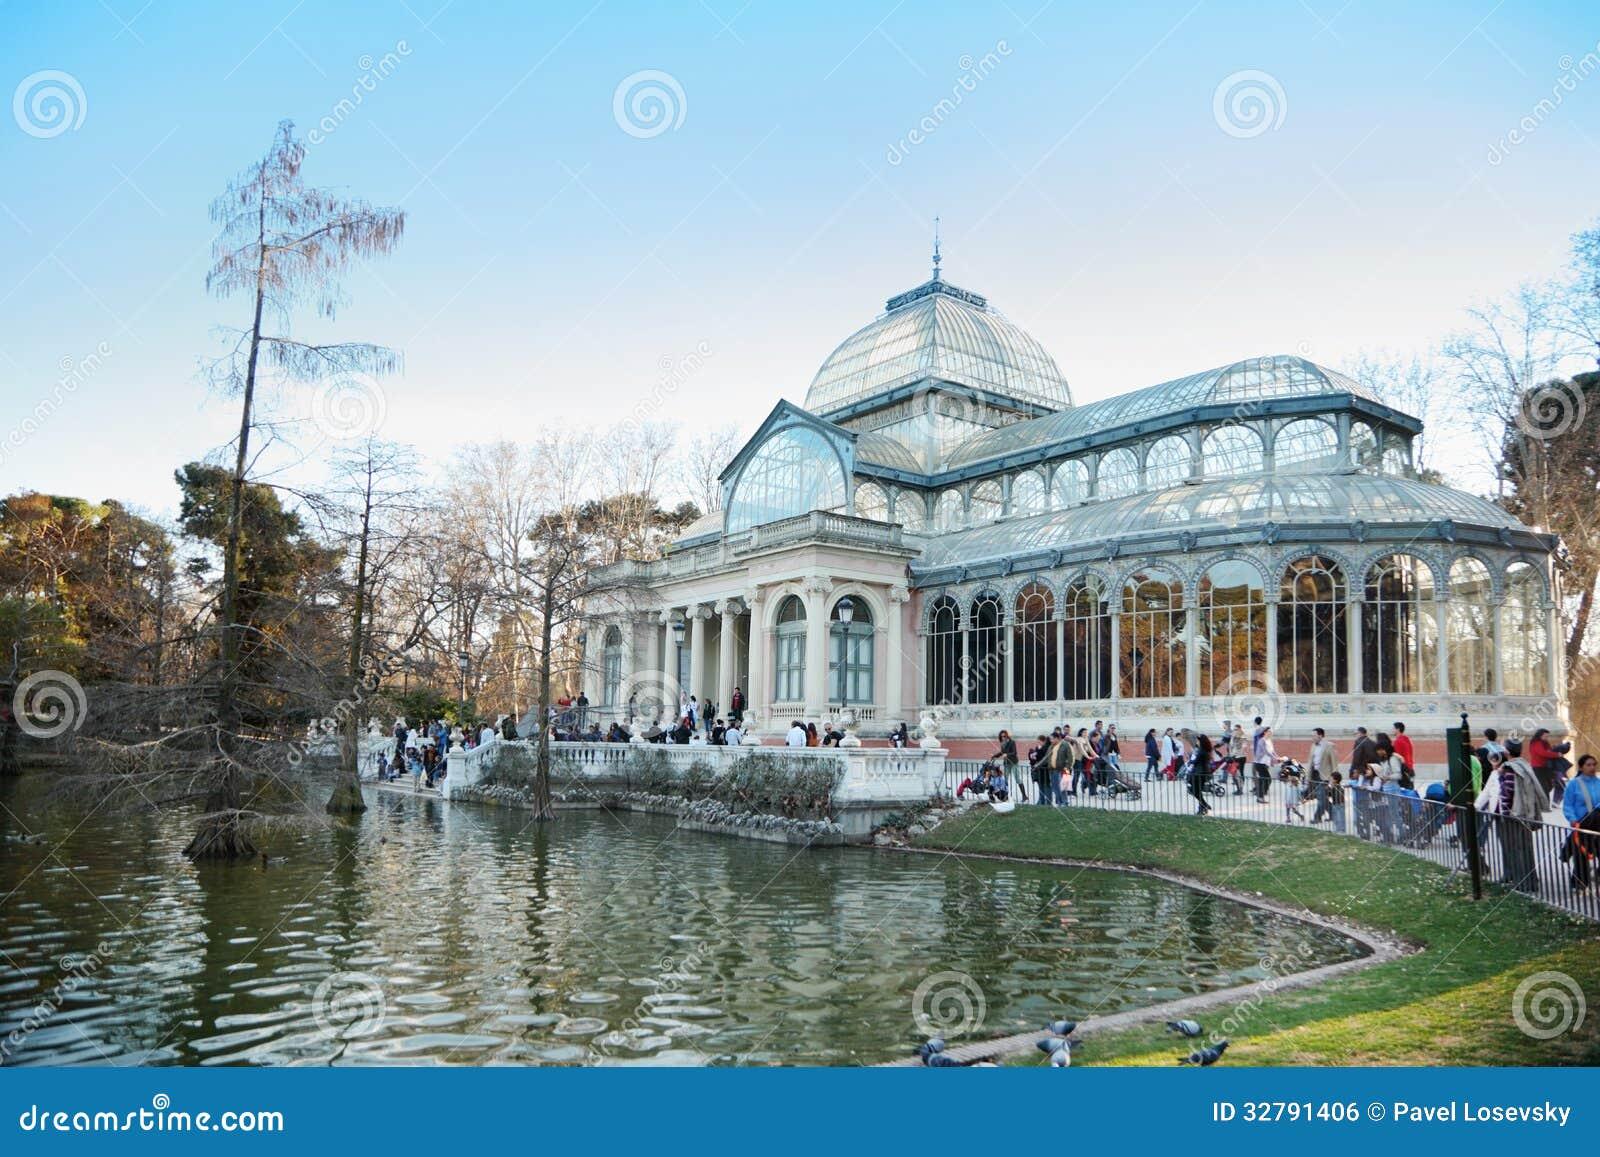 tourists walk near pond and glass pavilion editorial photo image